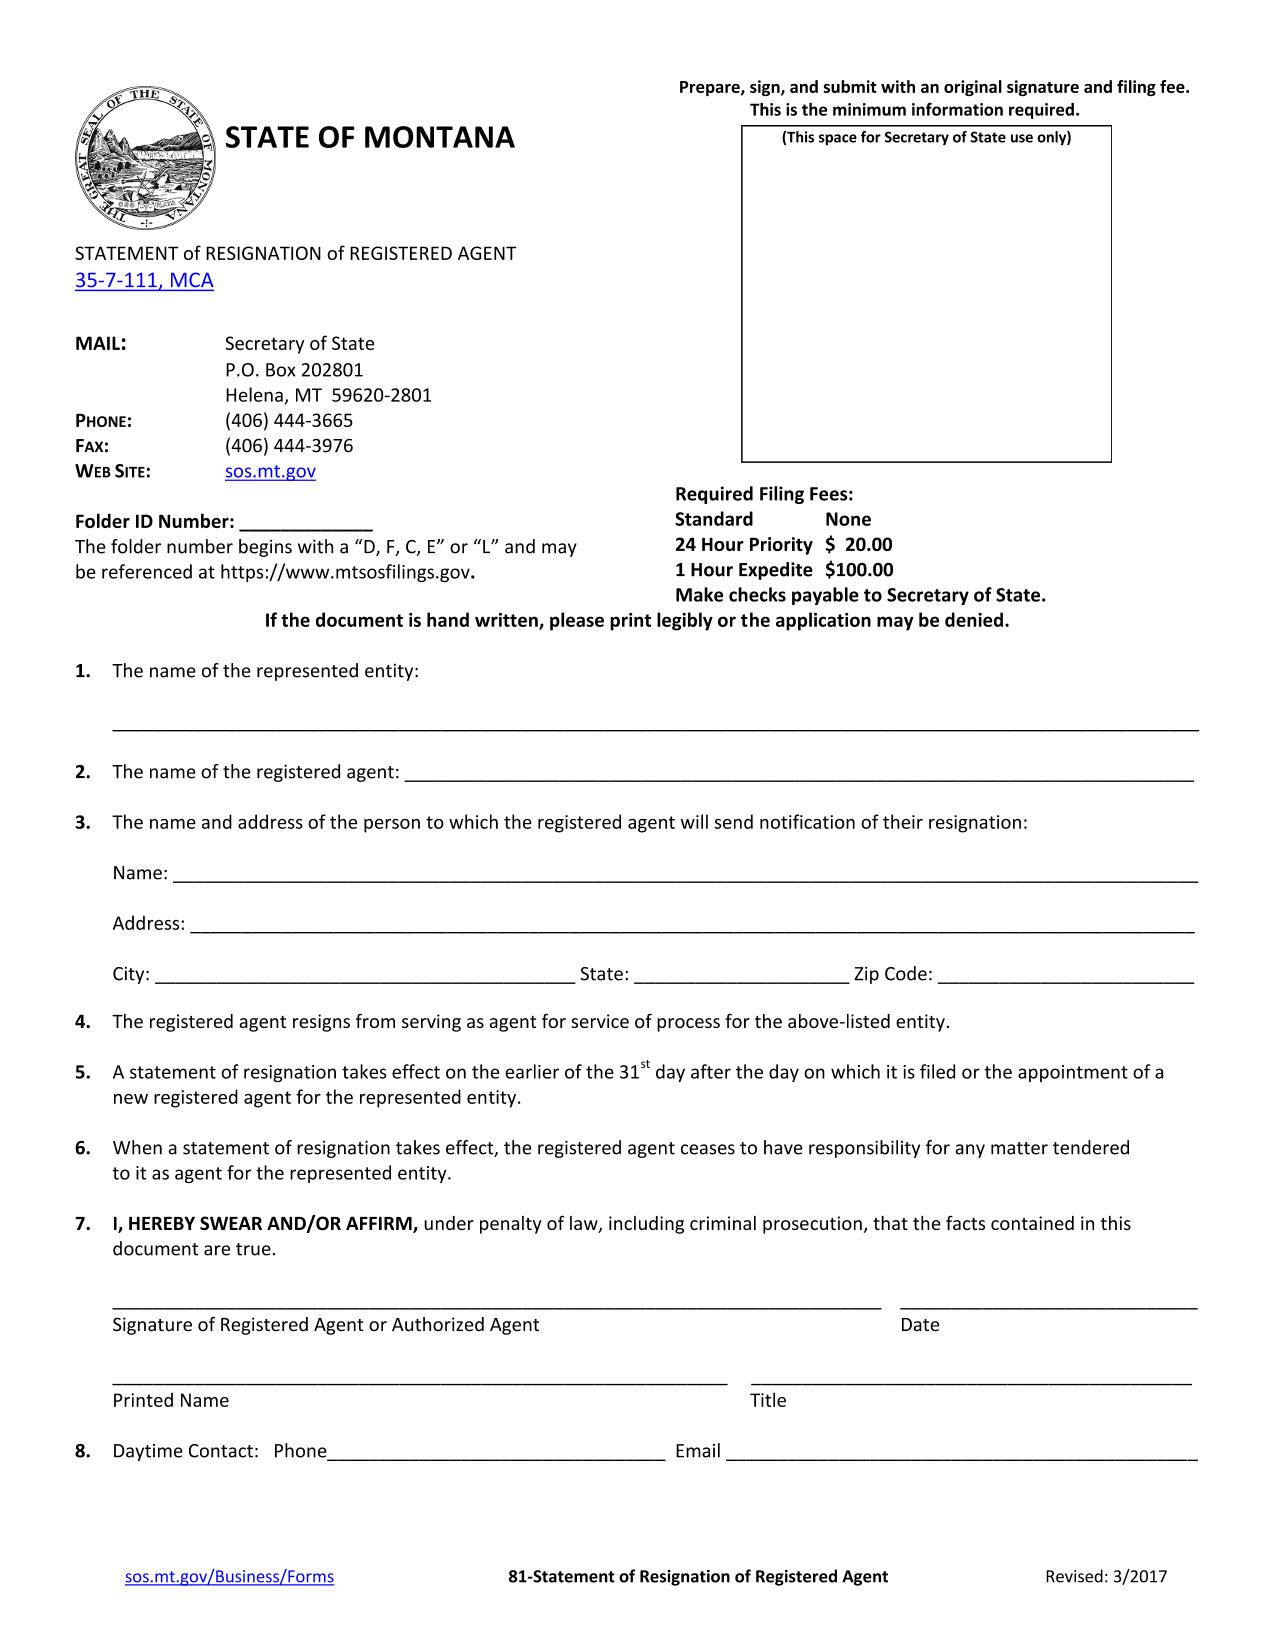 montana-statement-of-resignation-of-registered-agent